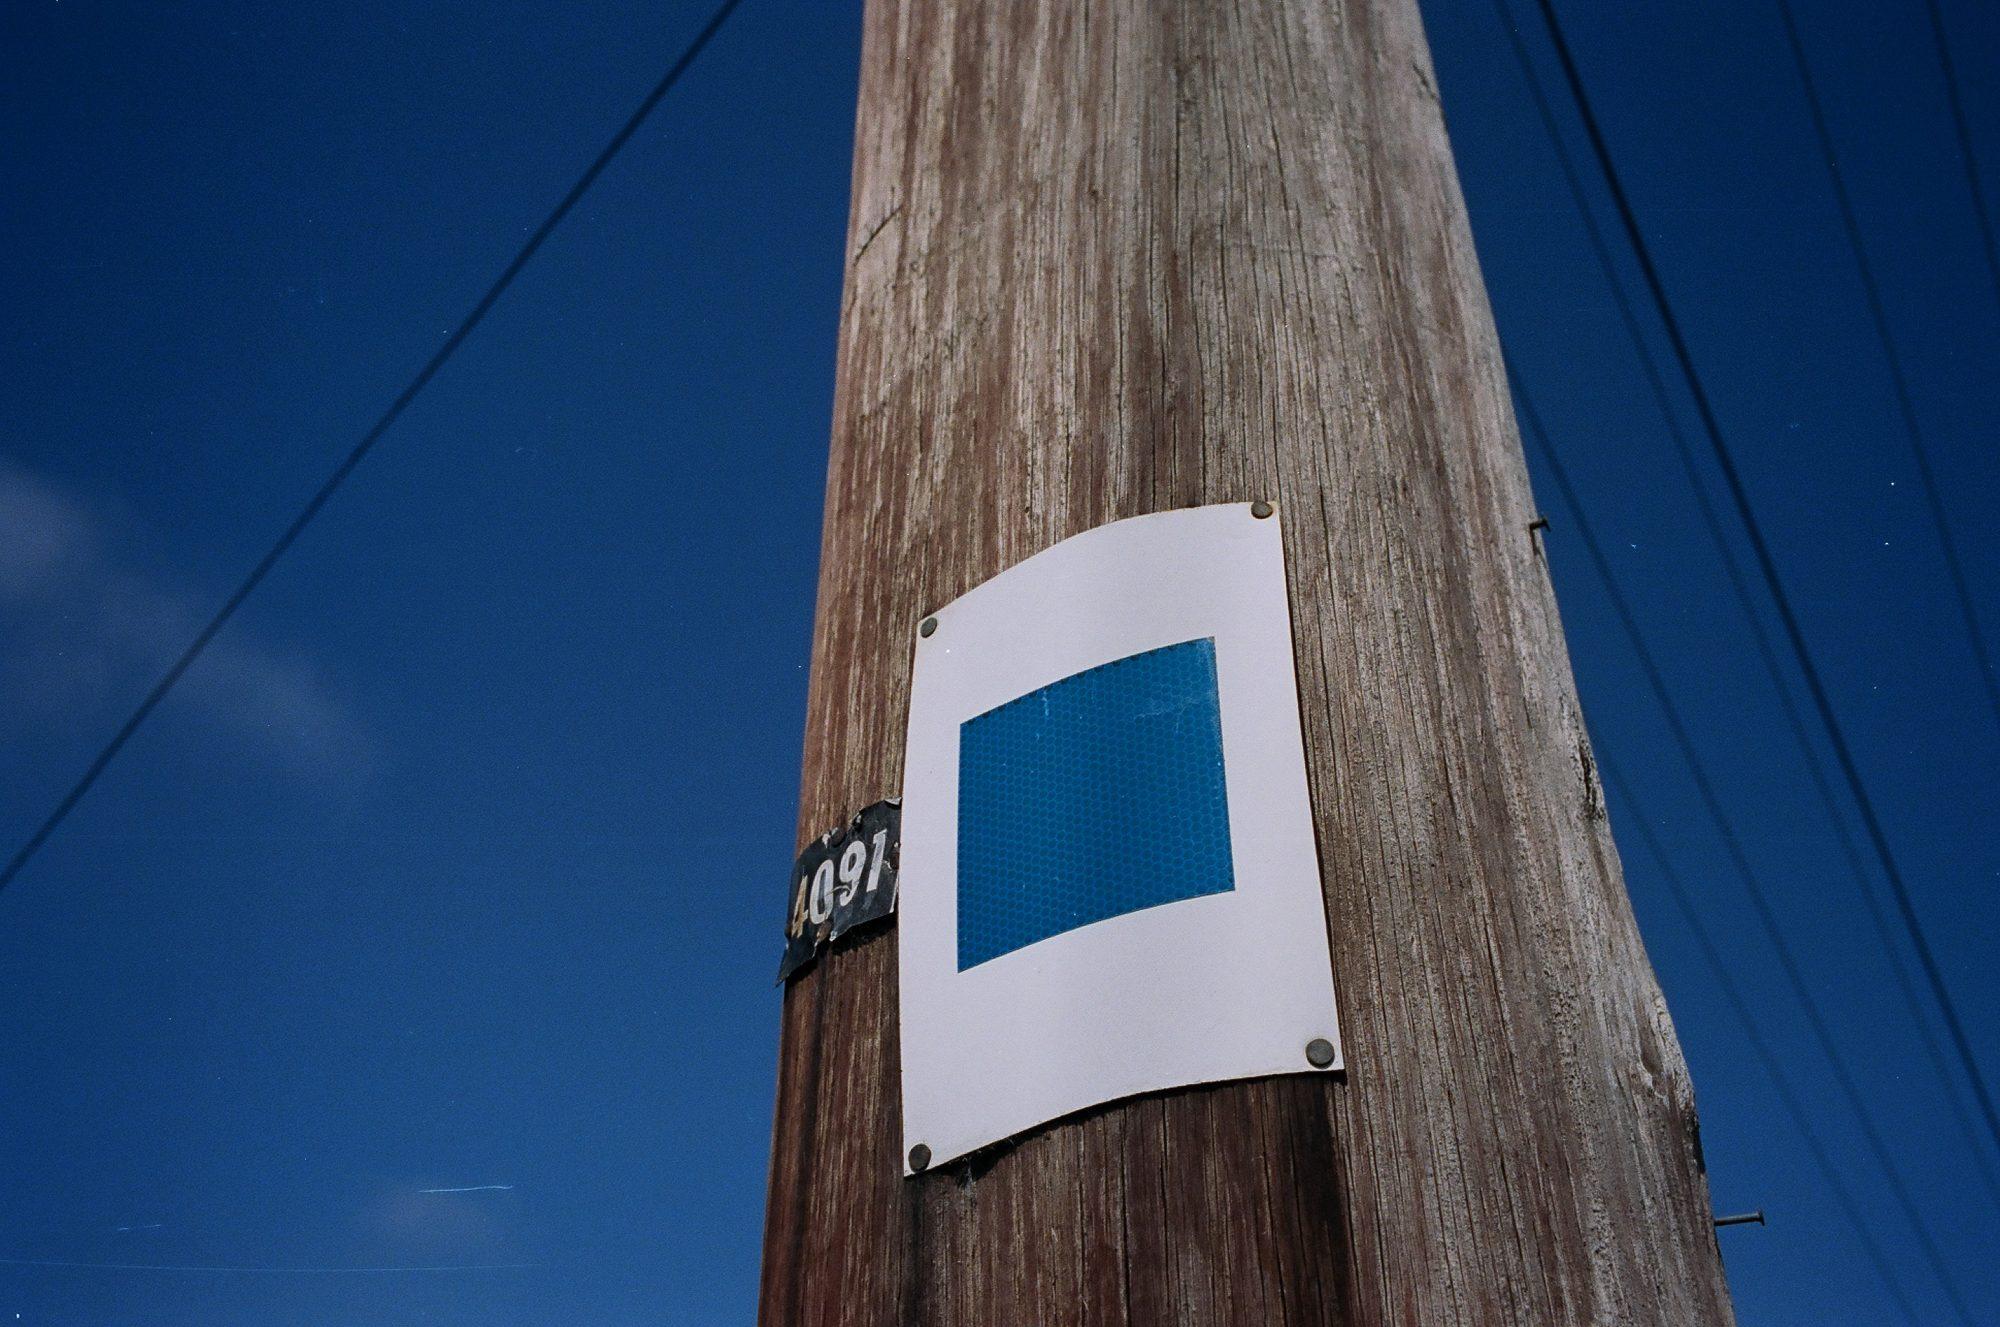 Blue square against blue sky. Surreal, 2013